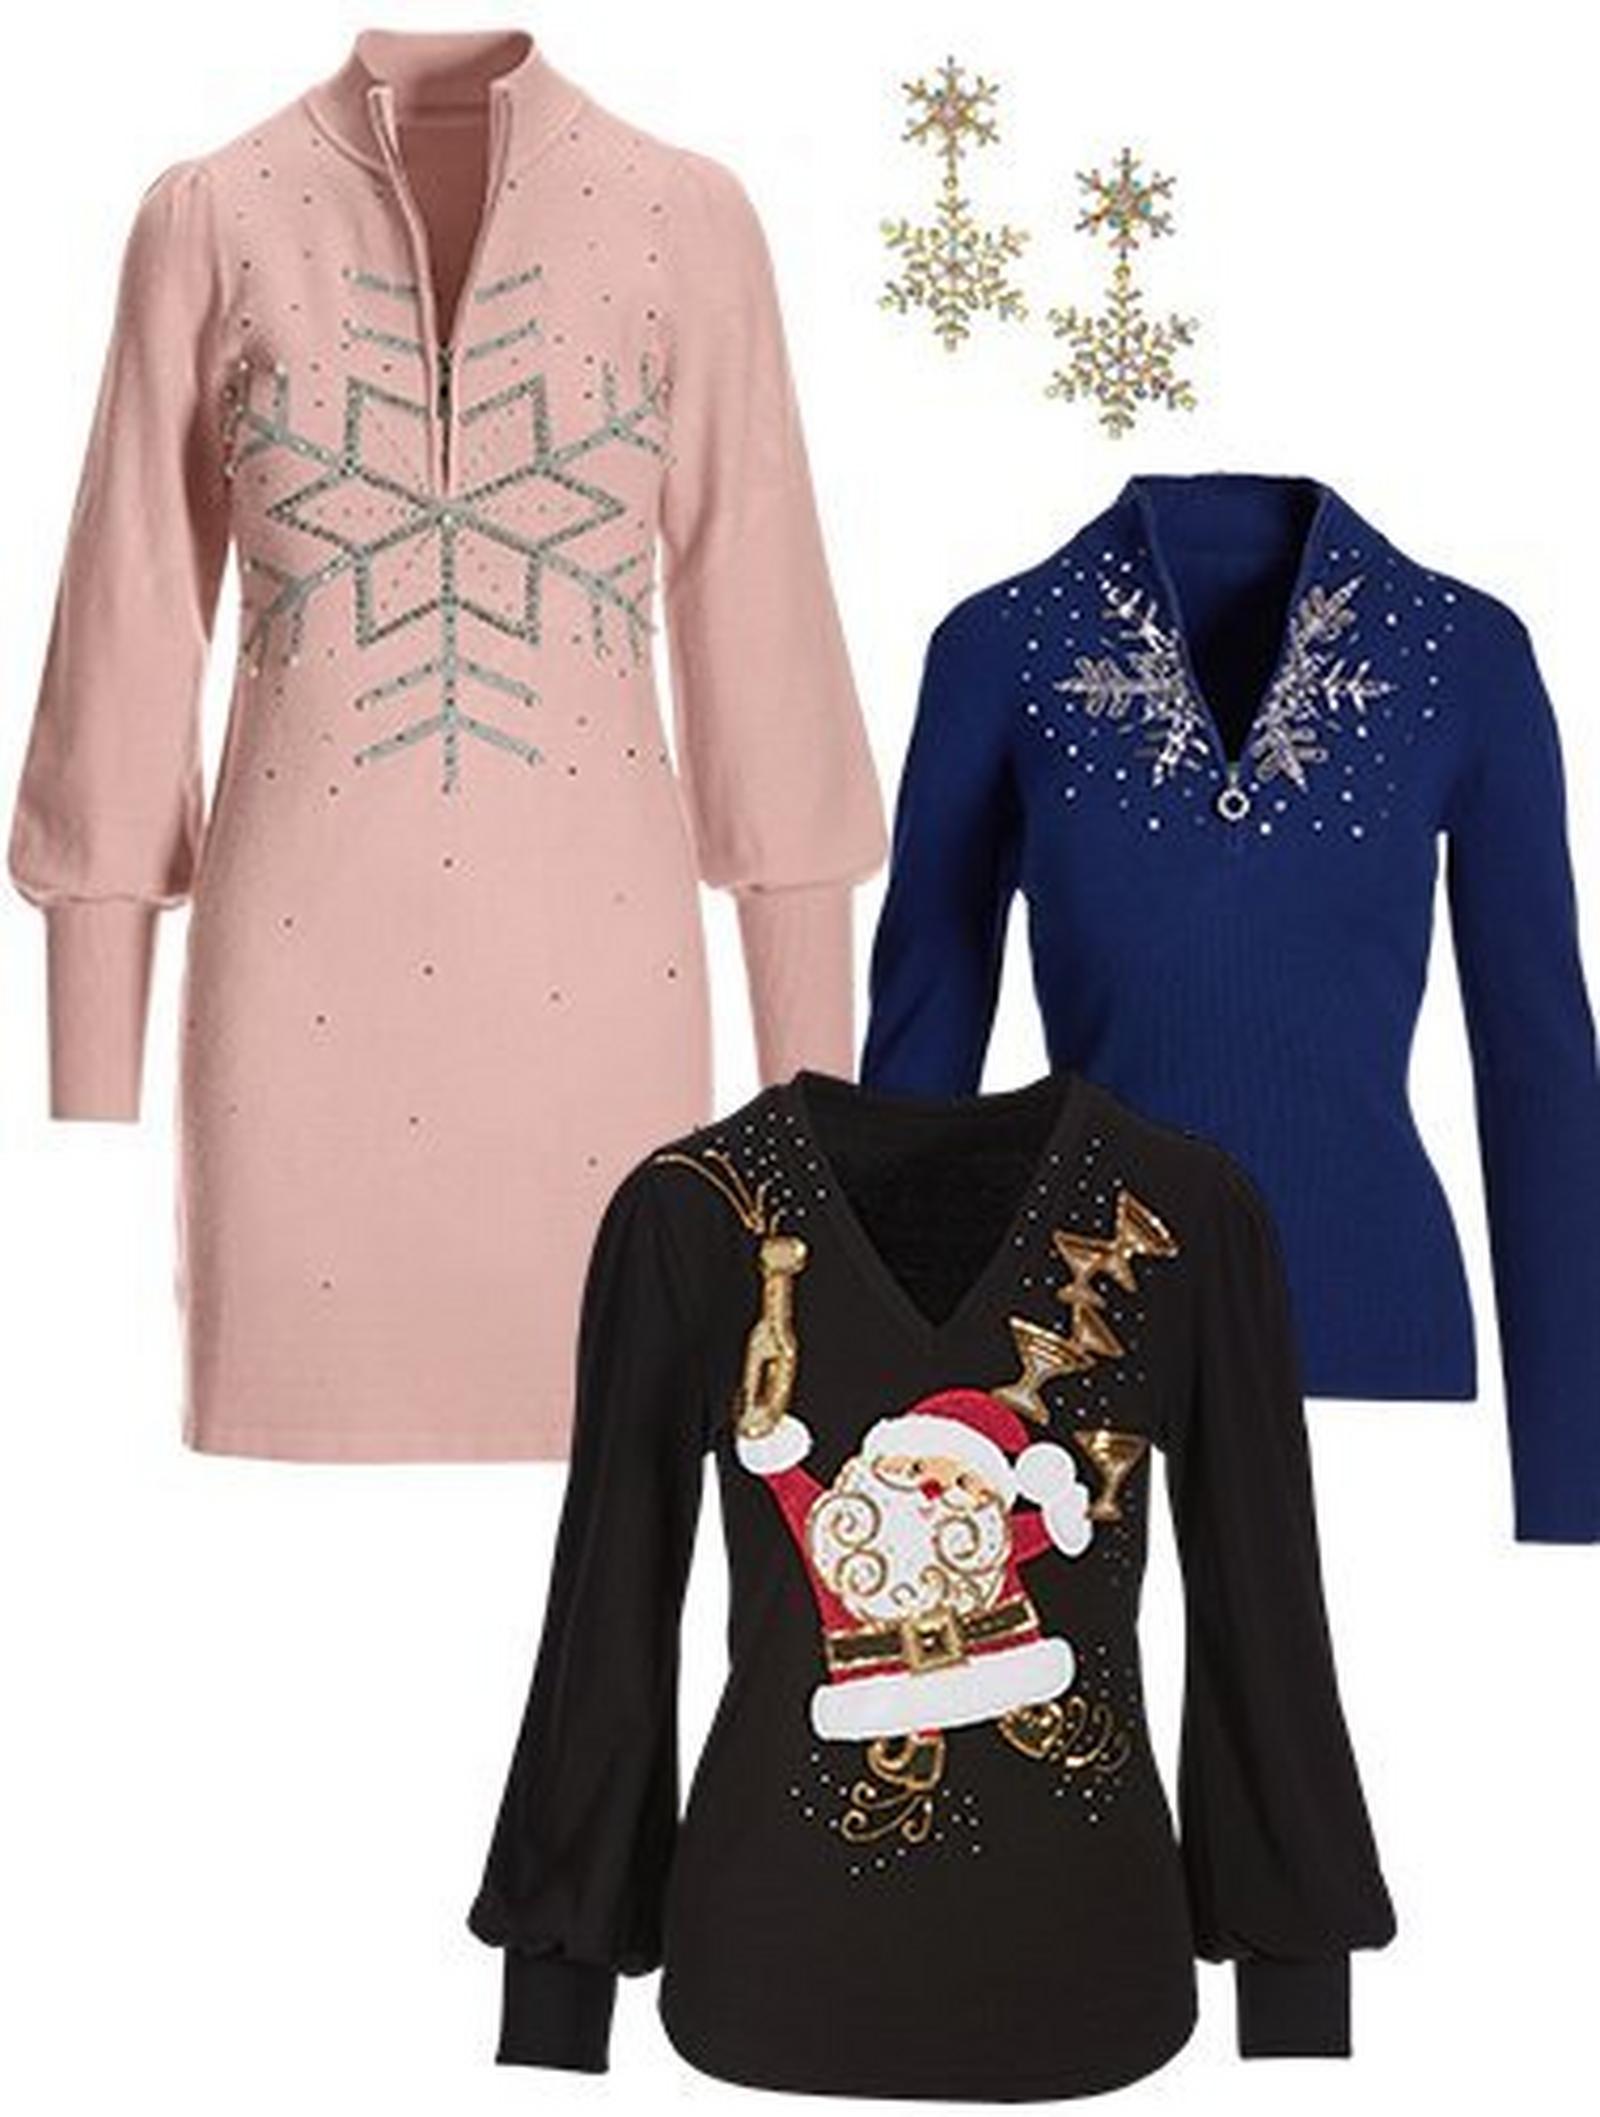 light pink long-sleeve sweater dress with rhinestone embellishments, santa puff-sleeve sweater, navy snowflake half-zip sweater, and double snowflake earrings.